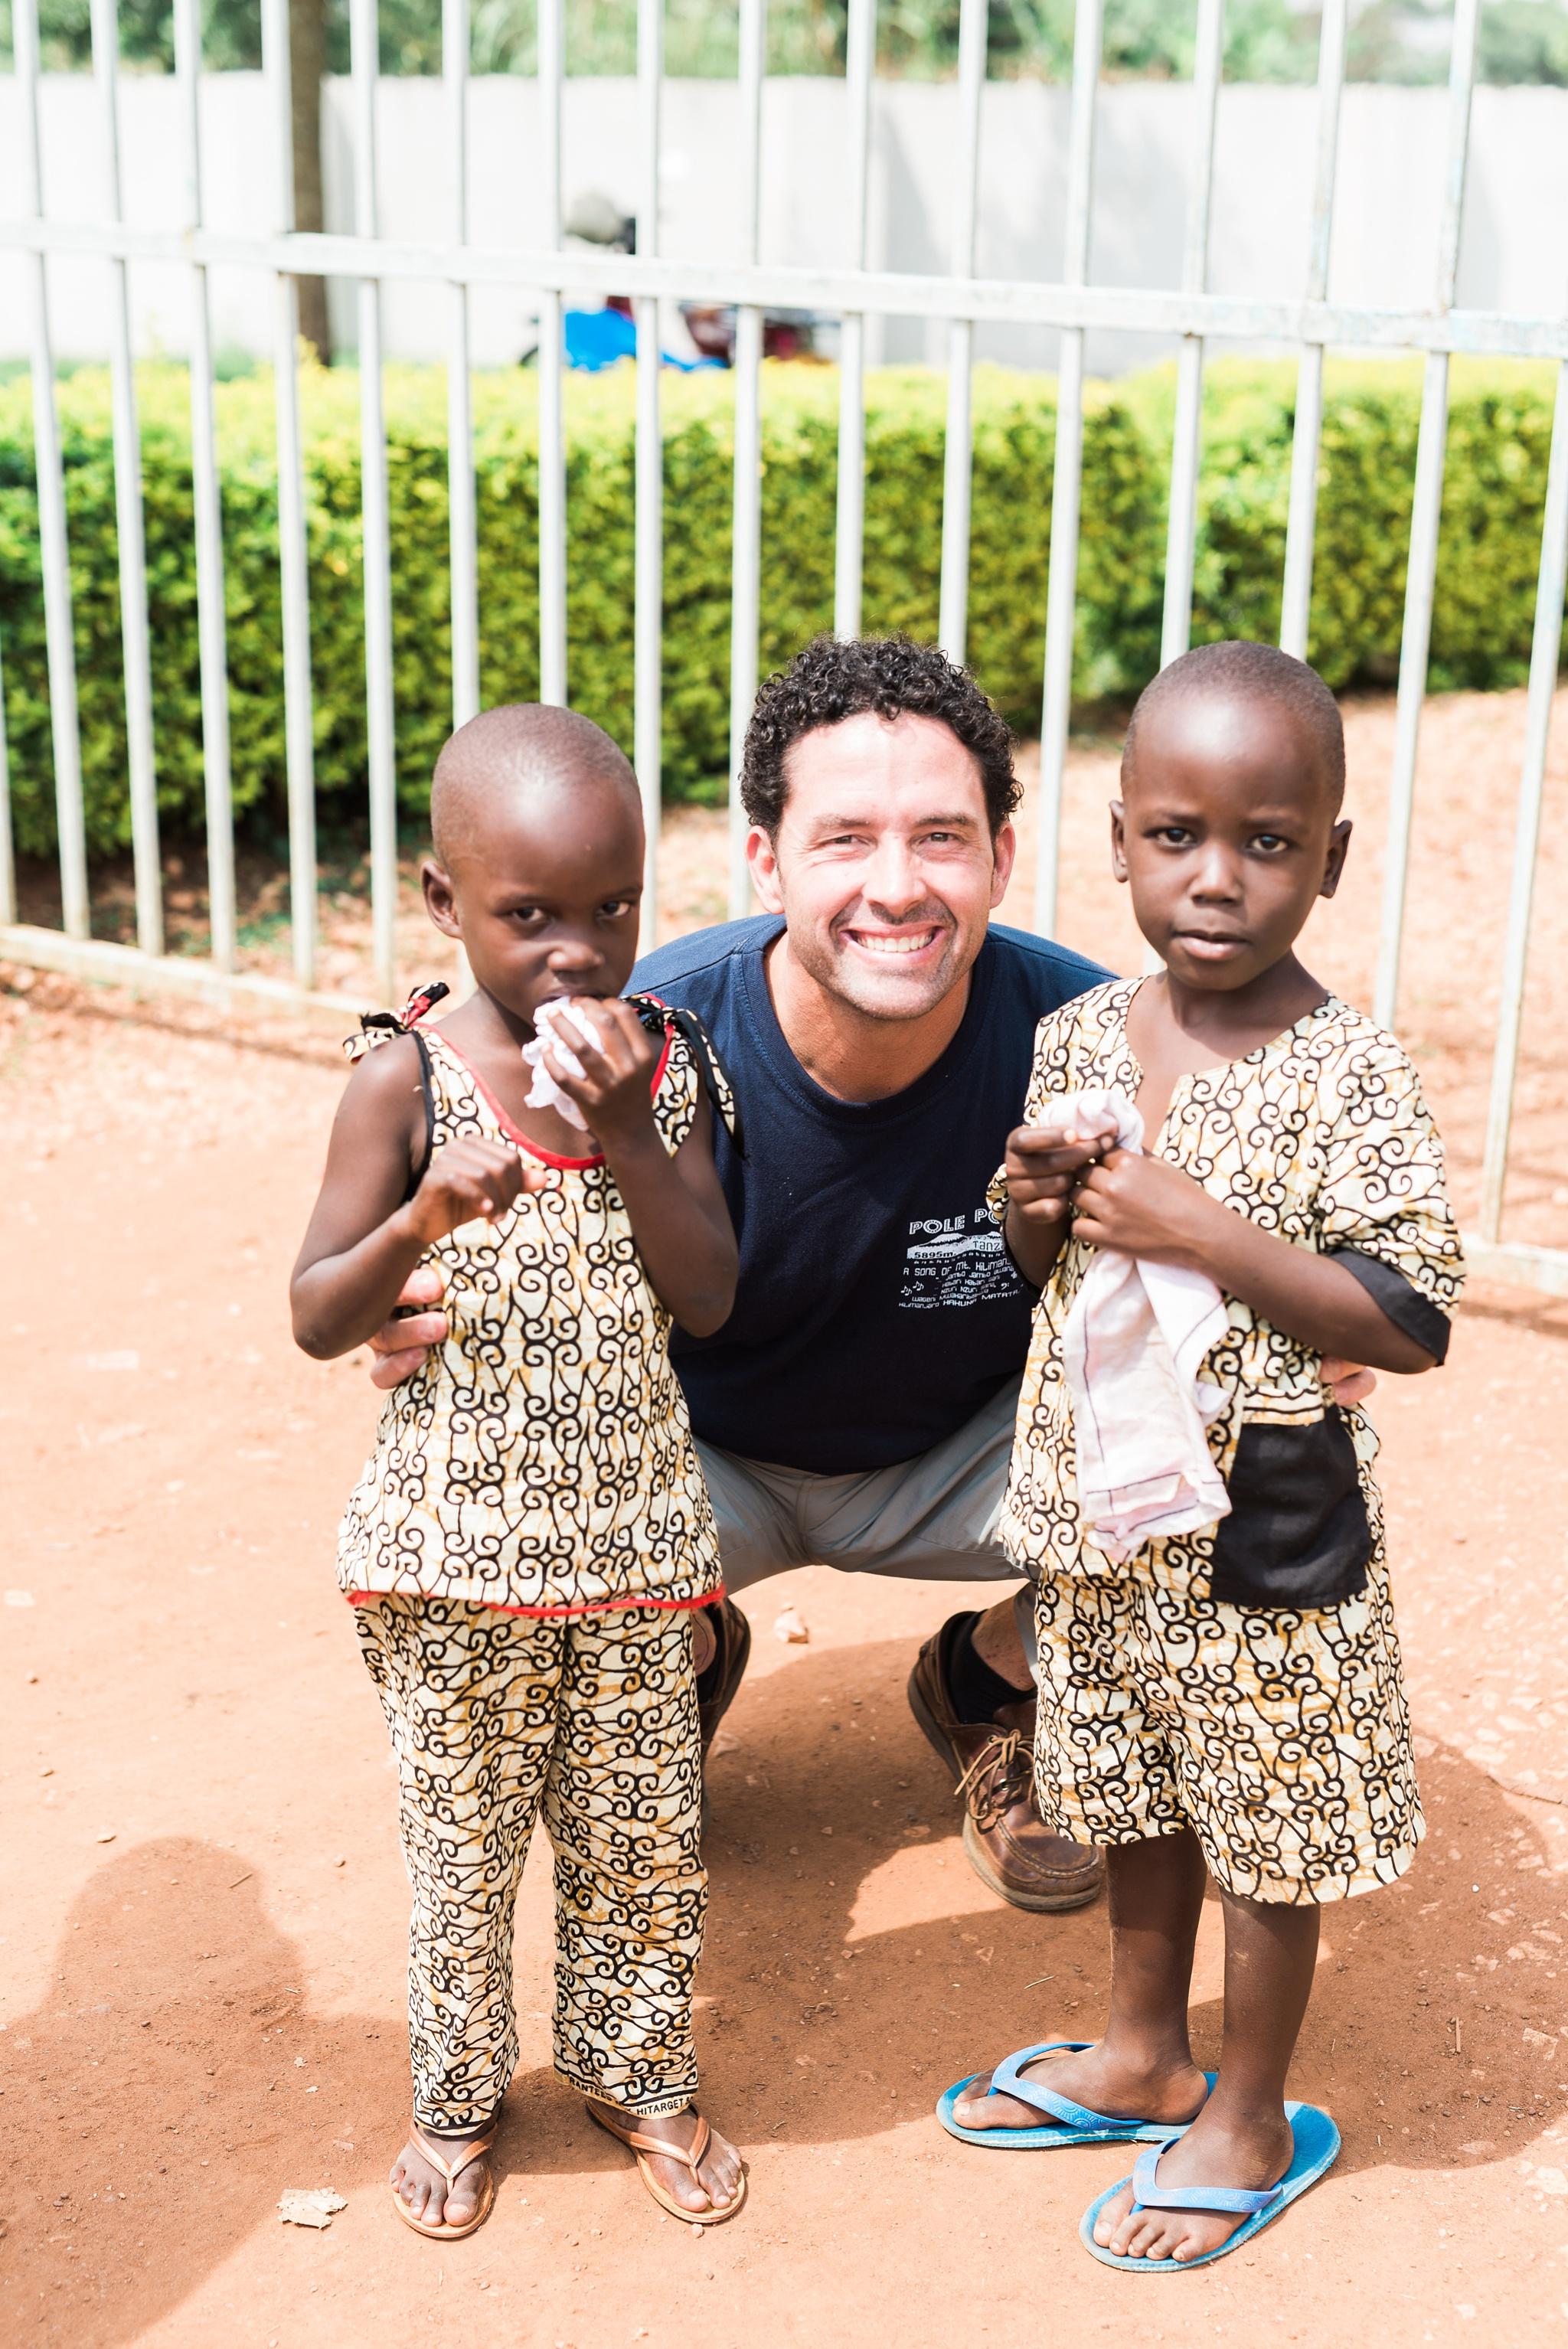 destination-photographer-uganda-graceforeducation-566.jpg